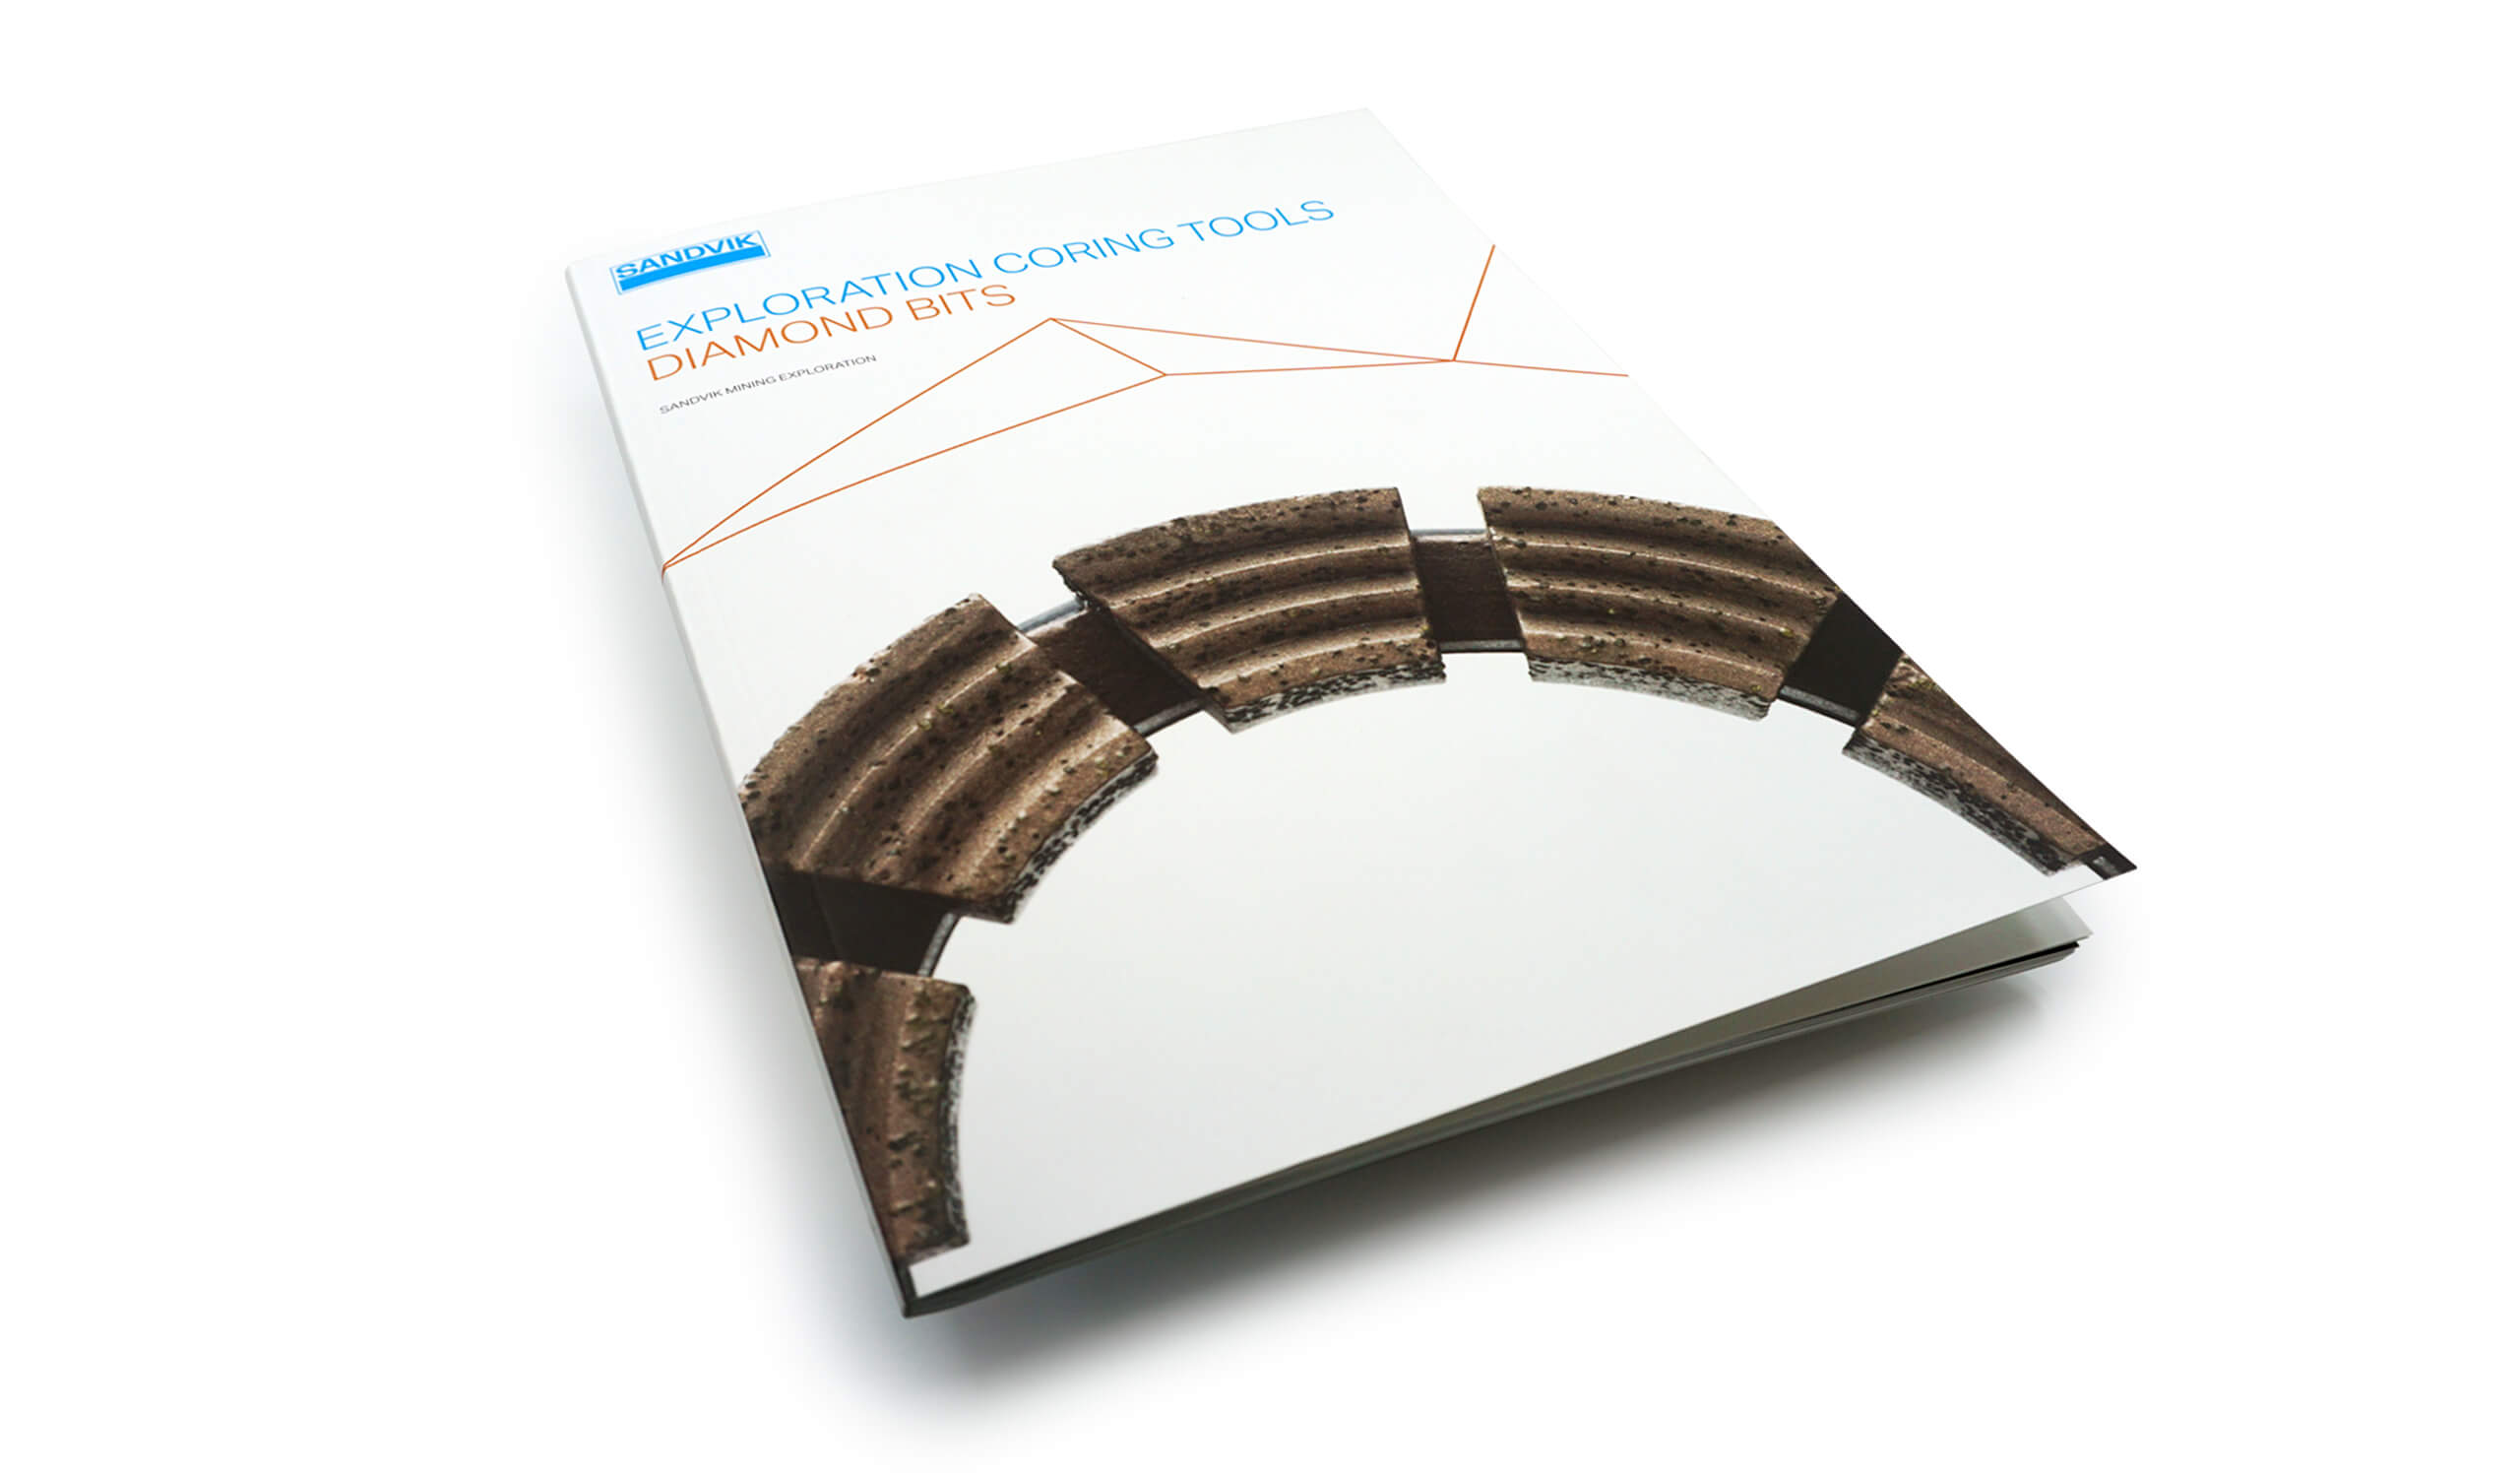 Sandvik-Diamond-Drill-Bits-Brochure-img01